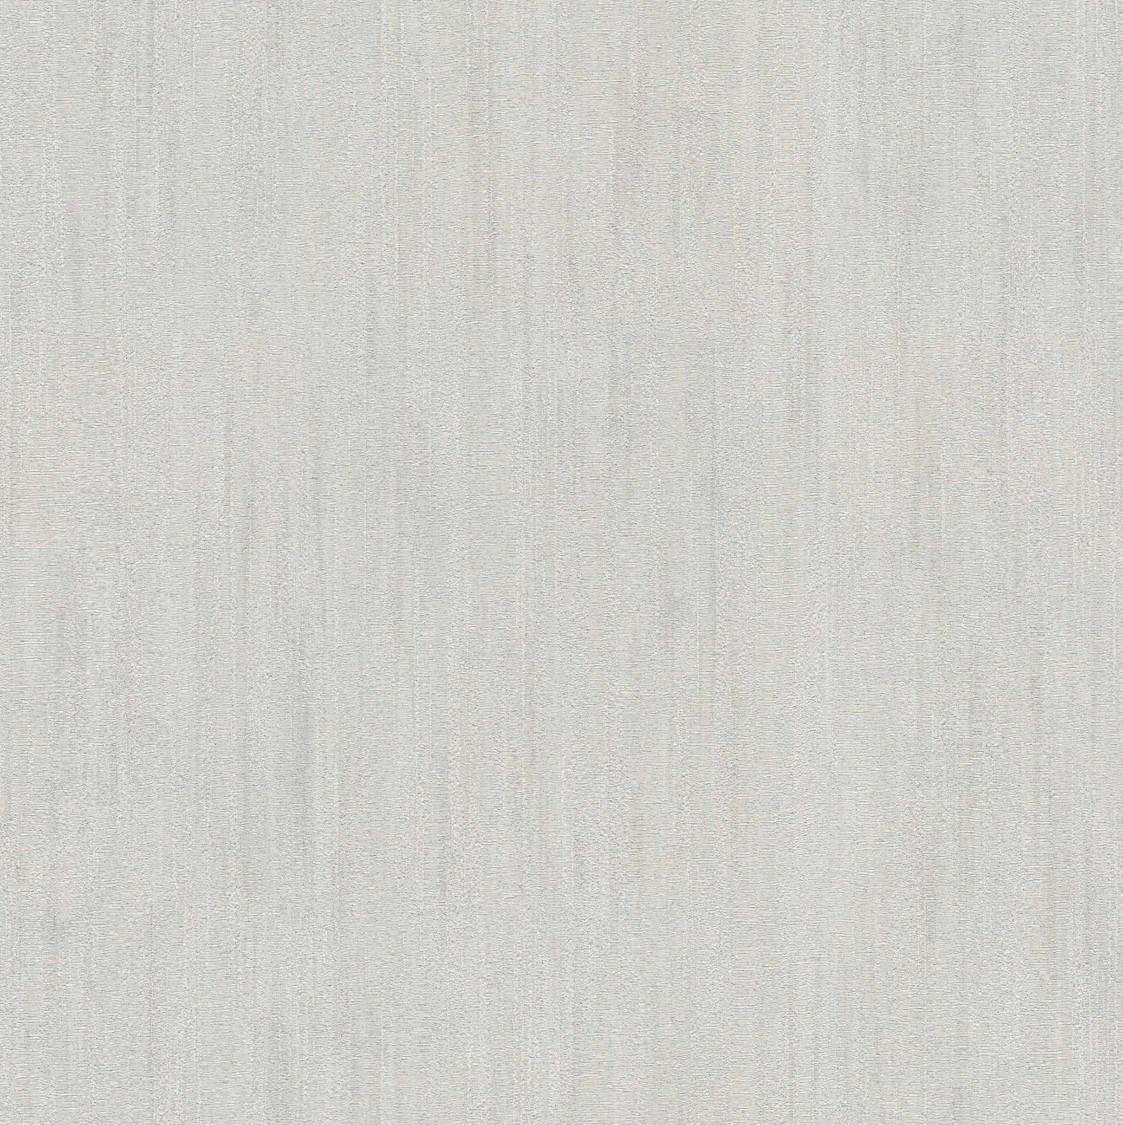 Fine decor milano 7 plain vinyl wallpaper m95591 grey for Gray vinyl wallpaper